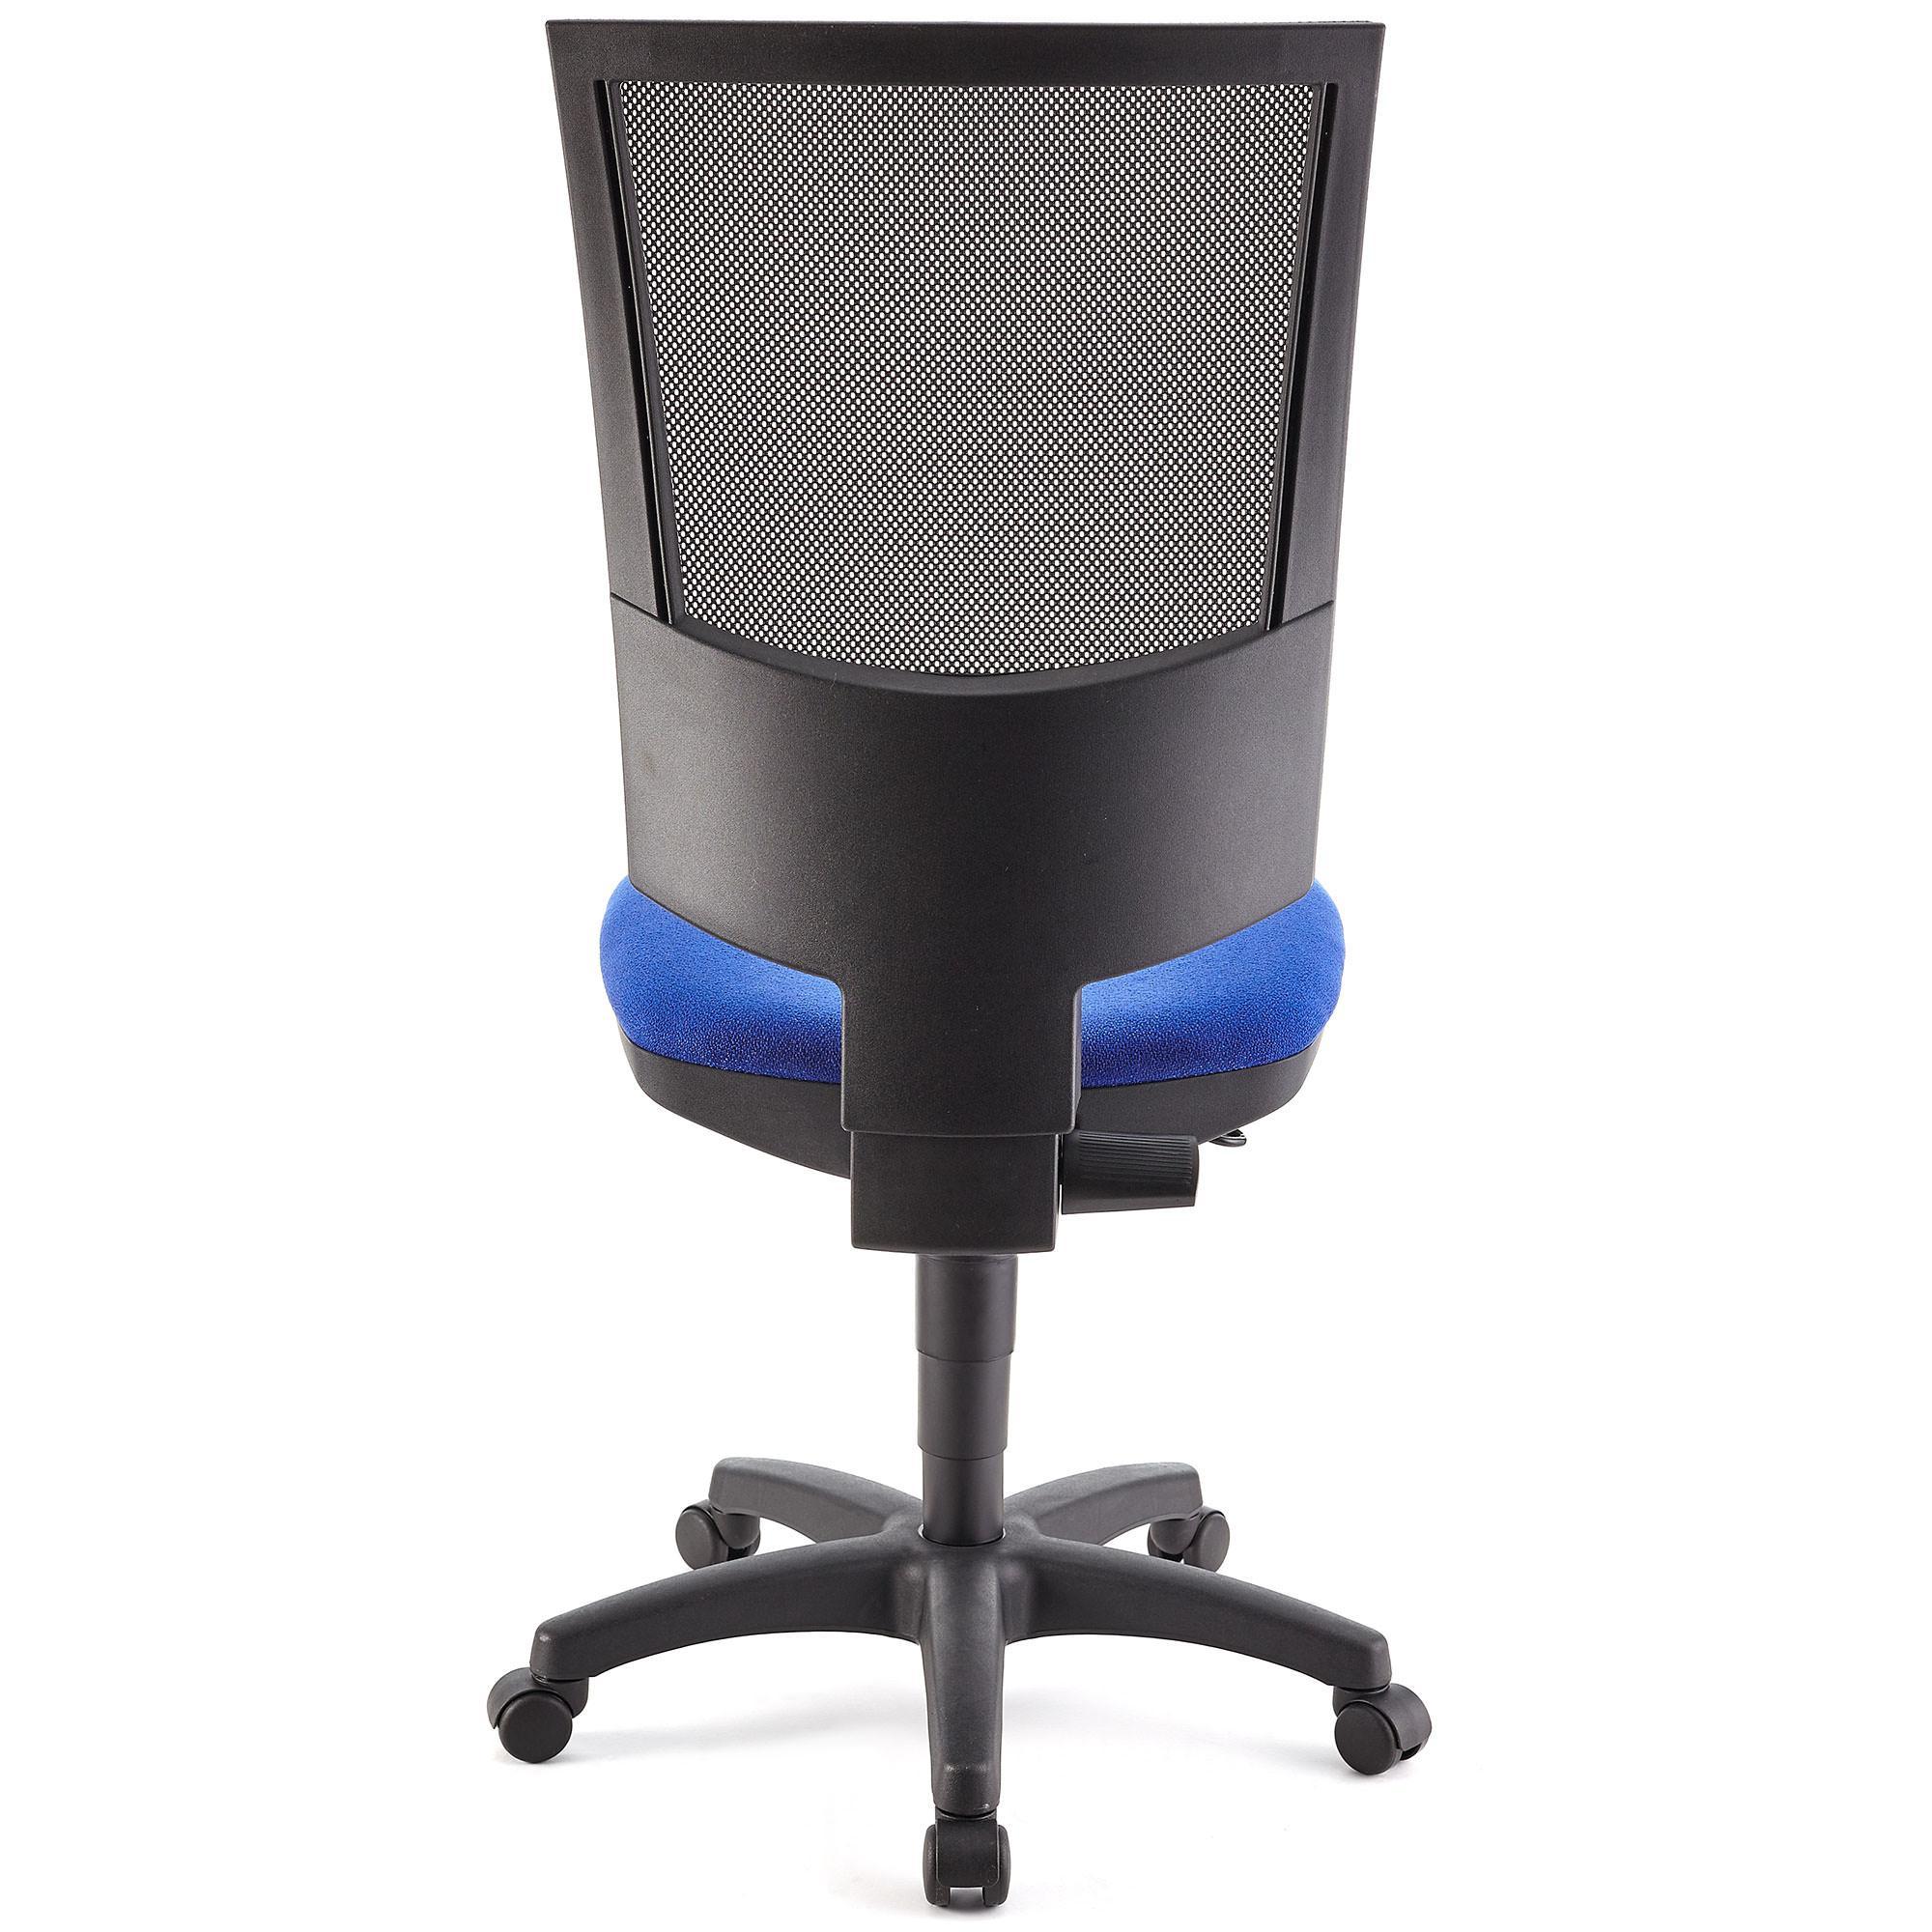 Silla de oficina pandora sin brazos respaldo ajustable for Silla escritorio sin ruedas